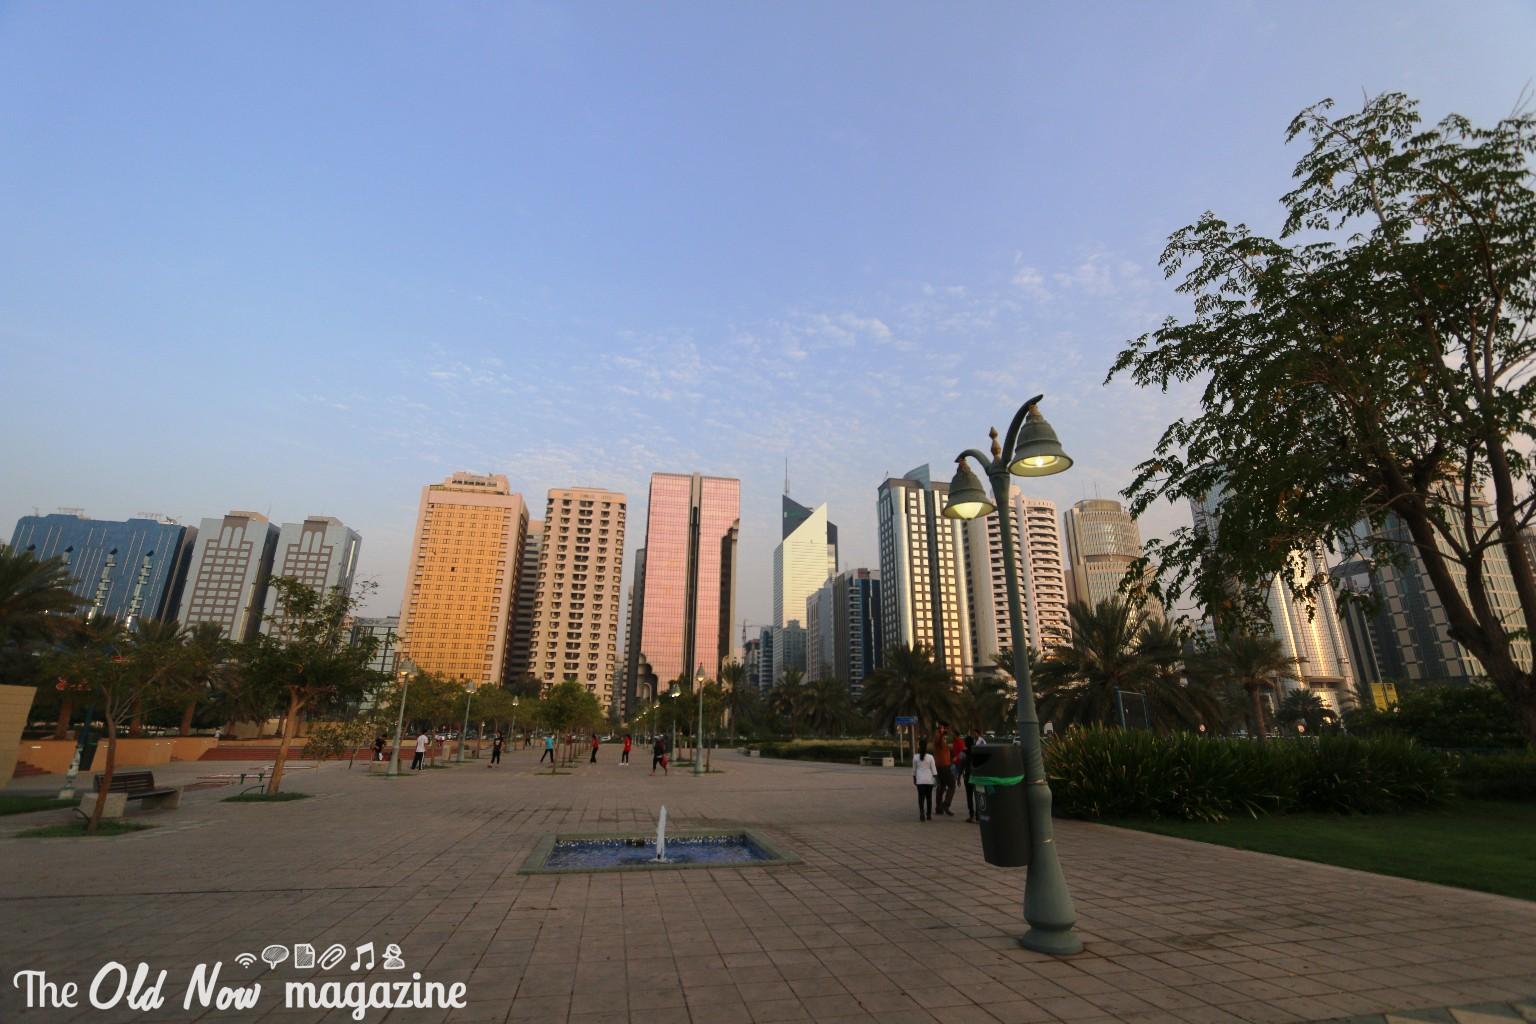 Abu Dhabi THEOLDNOW DAY 1 (29)